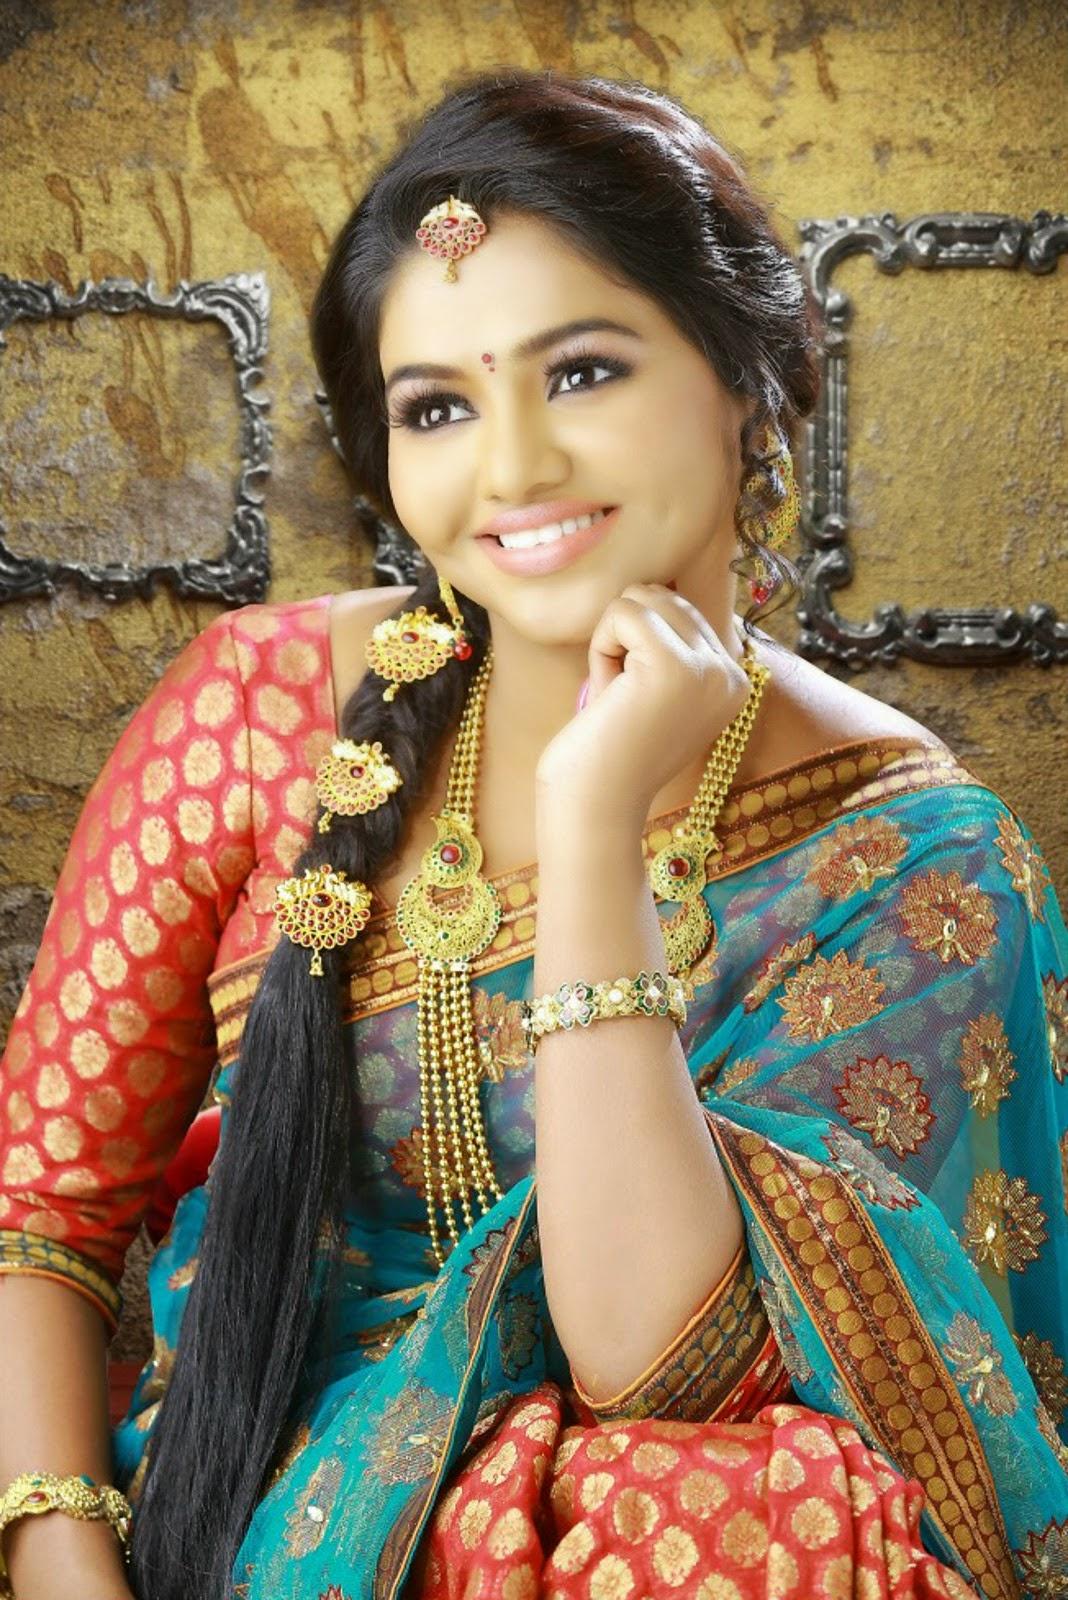 Latest 2015 Telugu Actress Harini Saree Images | Harini